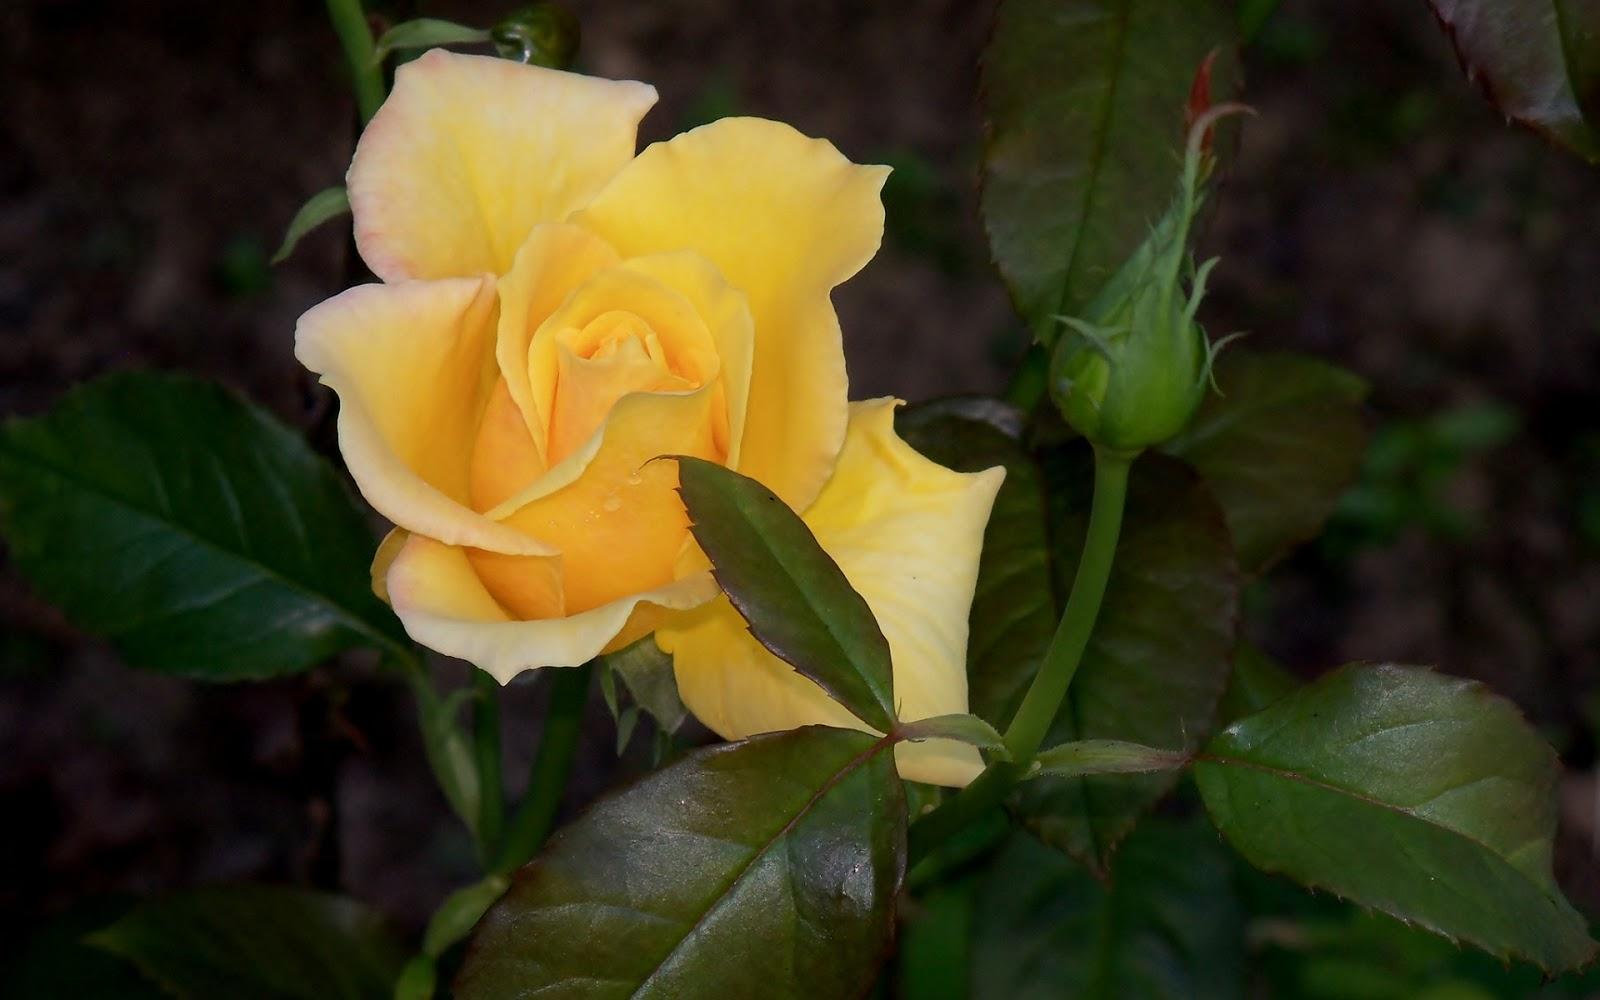 http://2.bp.blogspot.com/-3XISgz3W1cQ/UVlSYKa6xII/AAAAAAAAY-k/jAz4htv0XYI/s1600/yellow-rose-bud-leafs.jpg